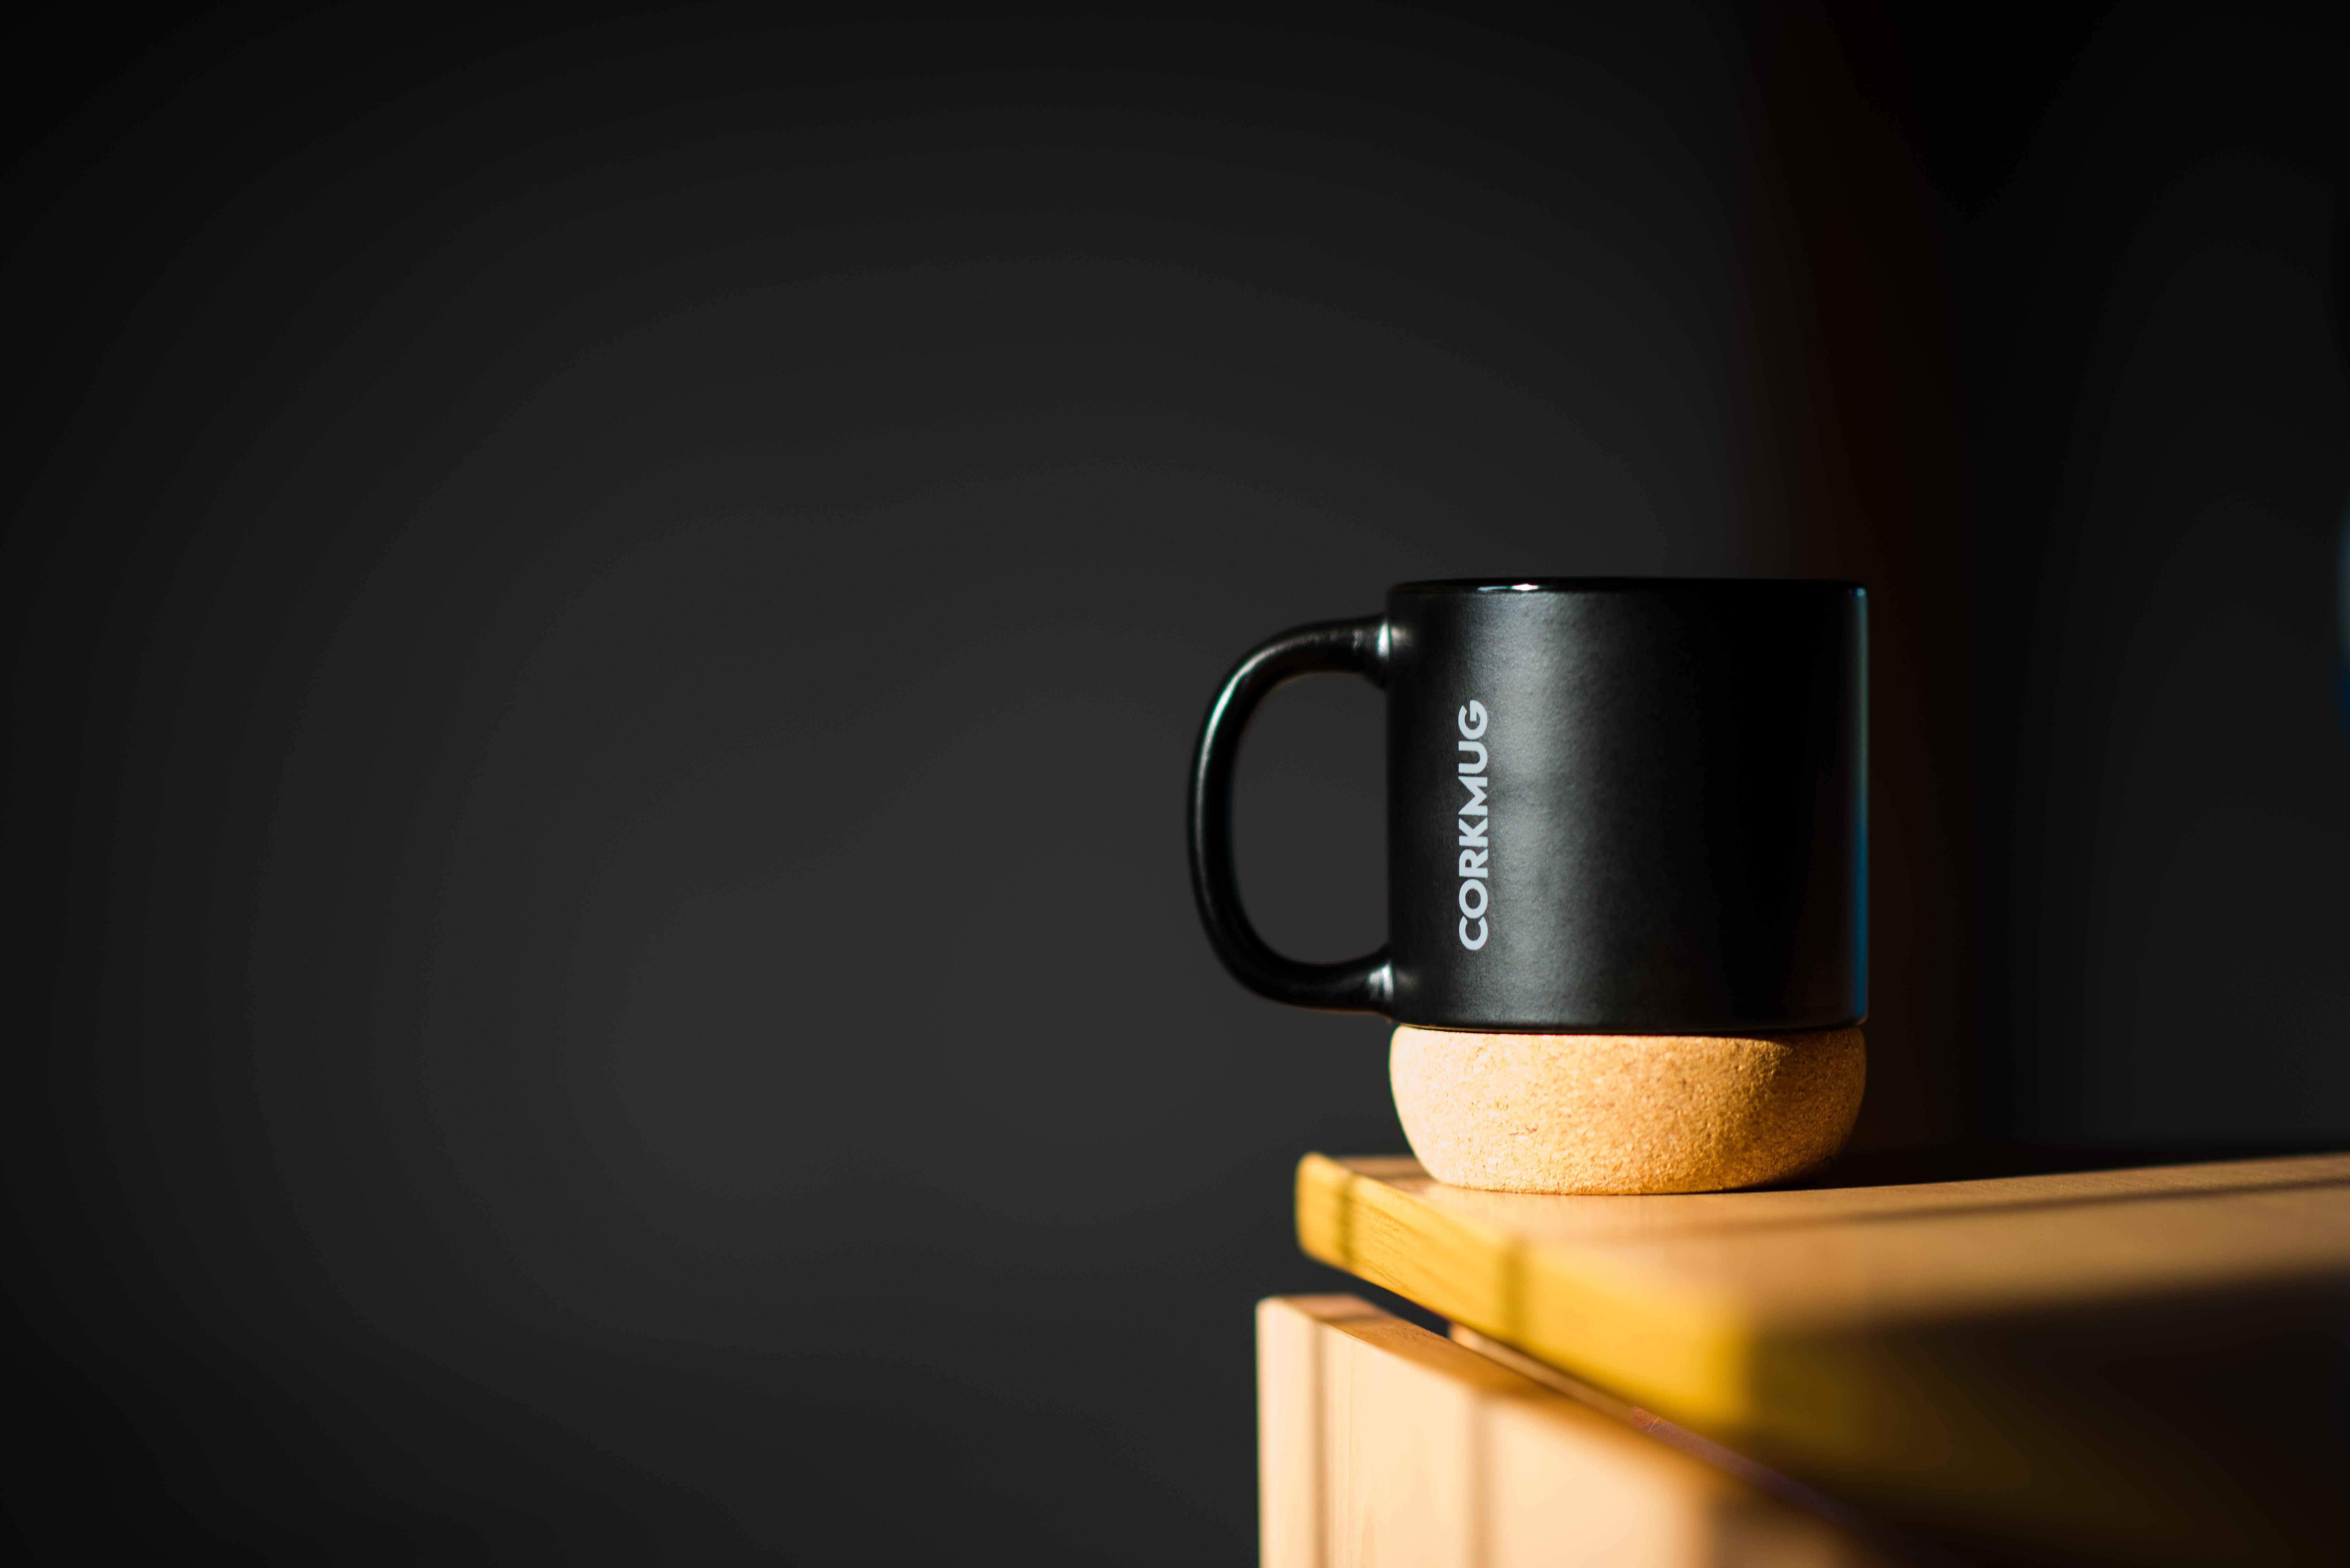 Stylish Chalkboard Black Ceramic Mug